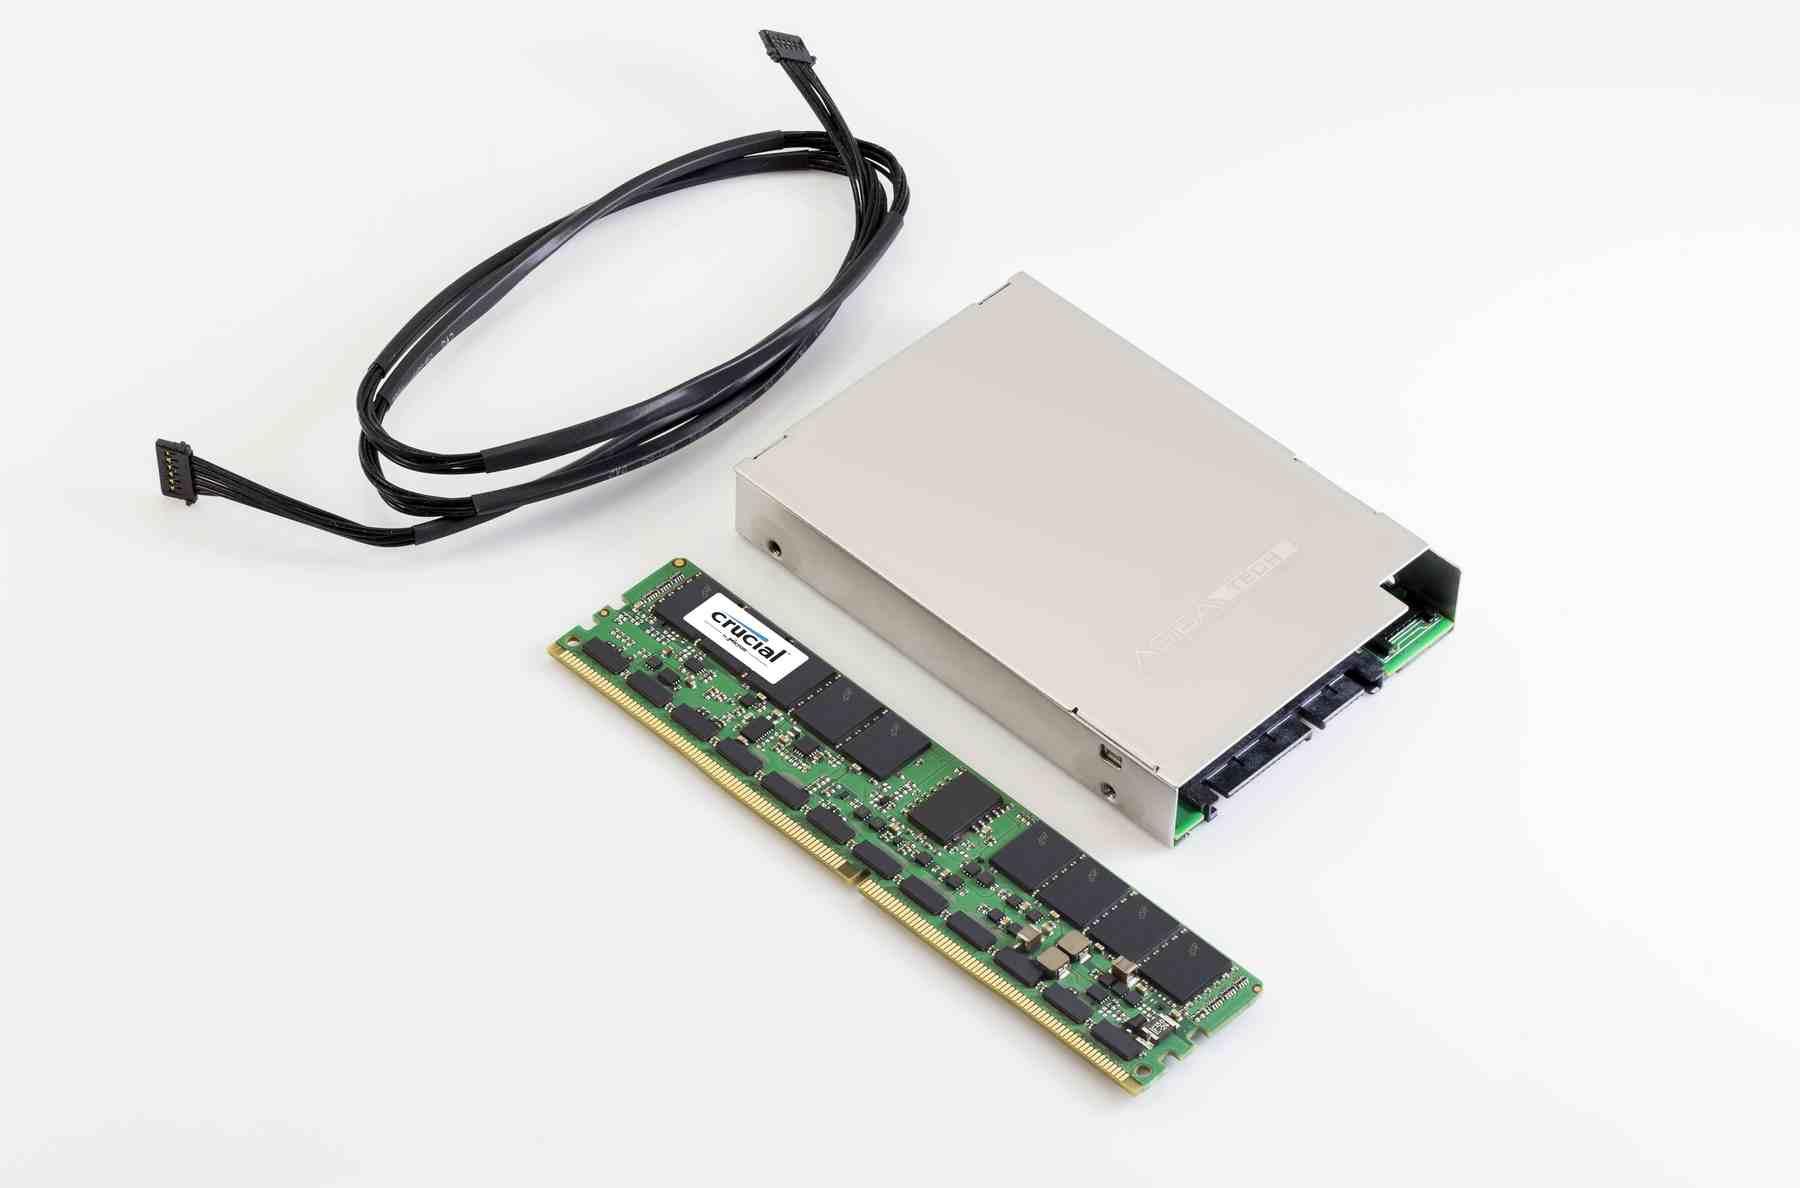 混合記憶體 NVDIMM 現身,用以填補 DRAM 與 NAND Flash 不足